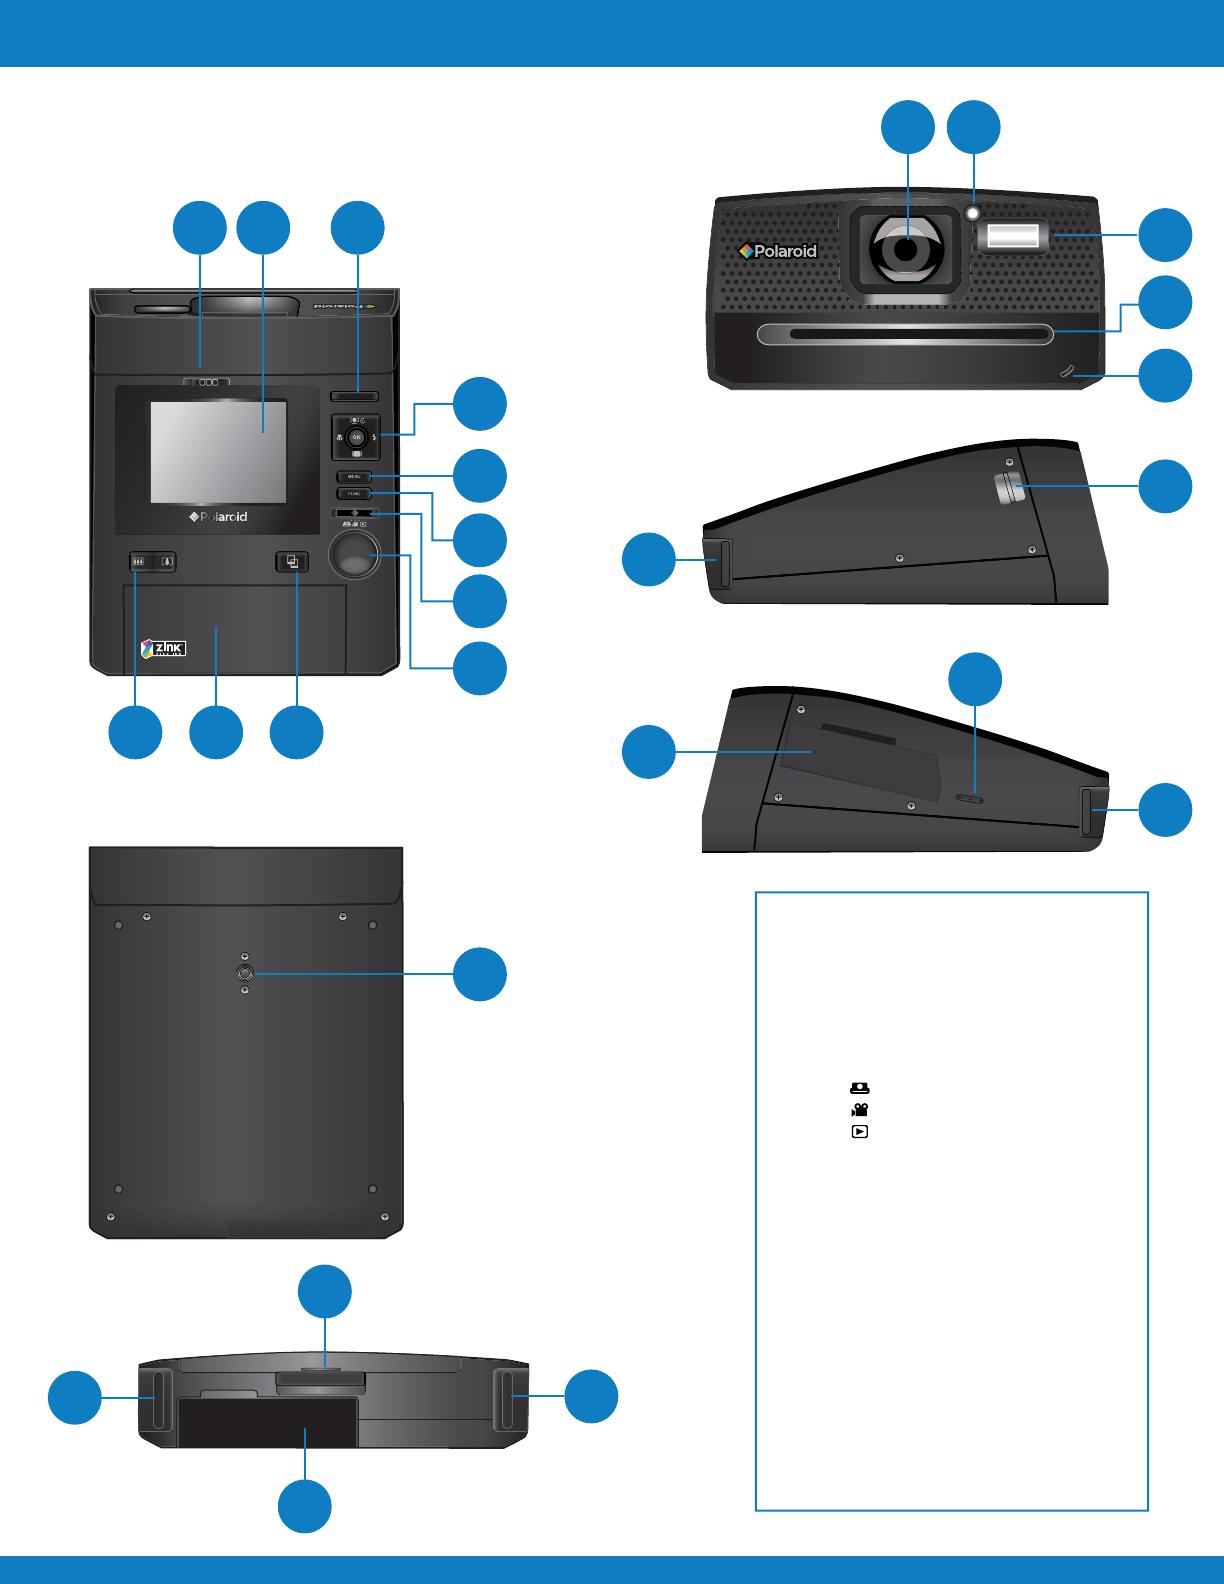 handleiding polaroid z340 pagina 3 van 64 english rh gebruikershandleiding com polaroid z340 manual pdf polaroid z340 manual pdf